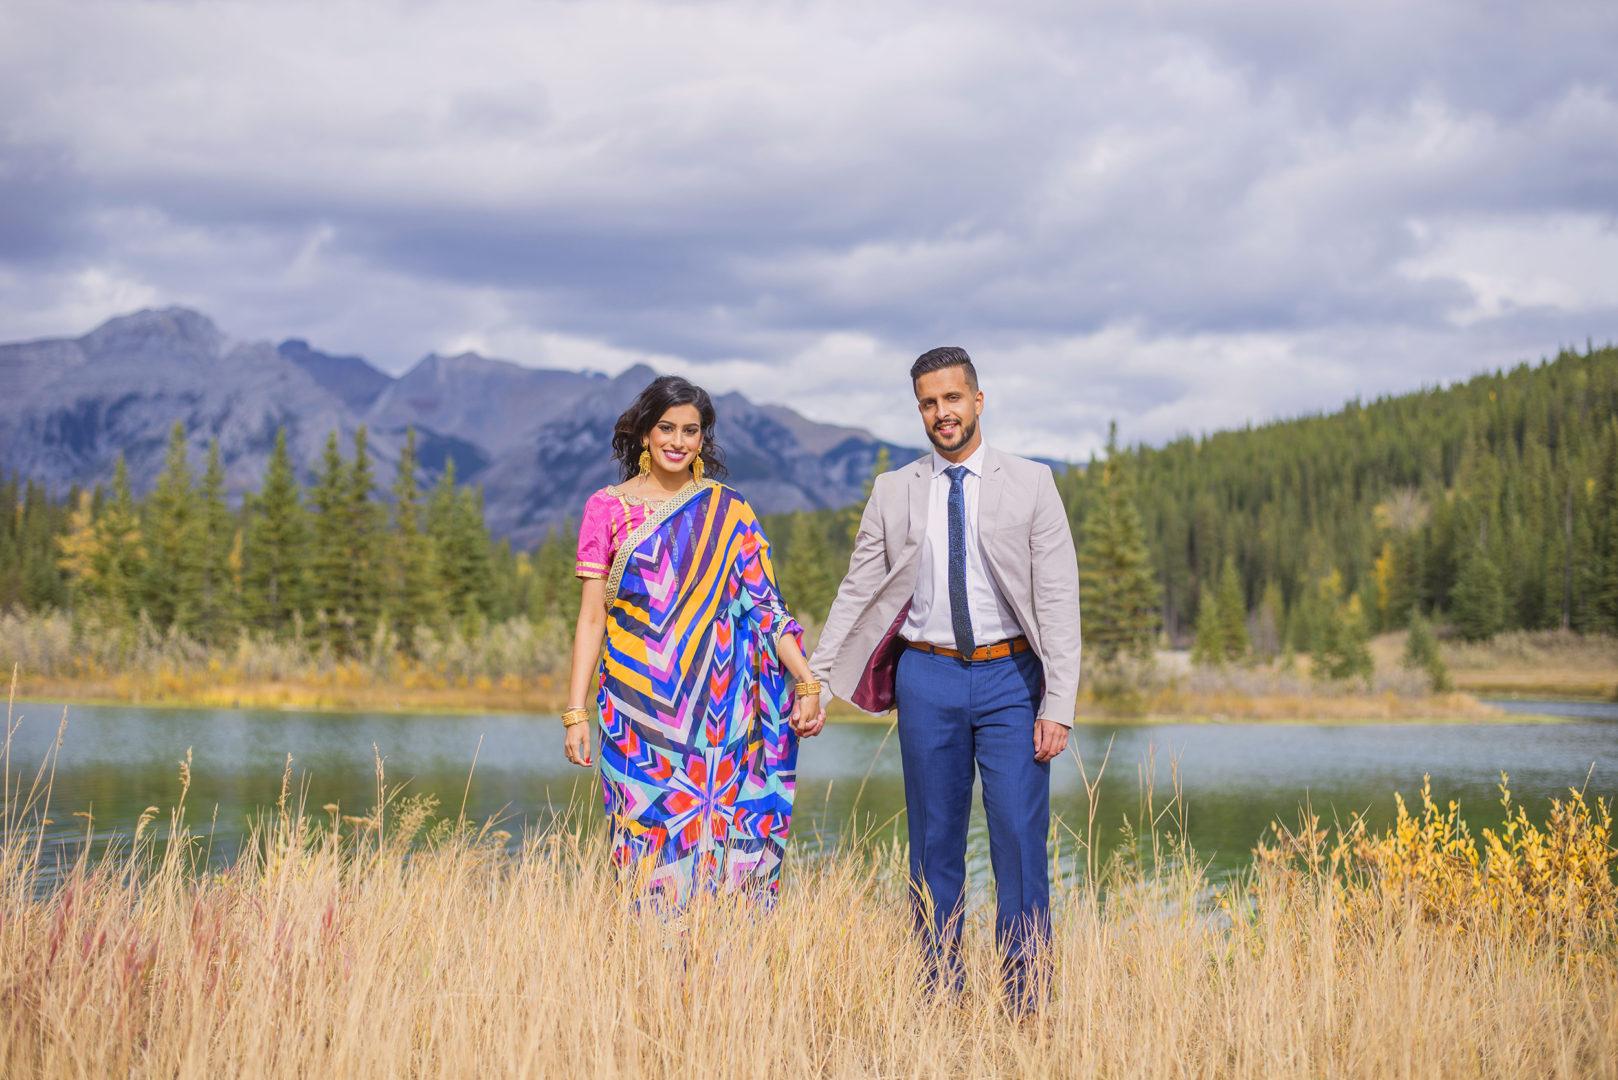 Photographer: Kiana Schiissler   Country: Canada  Title:   Mountain Romance